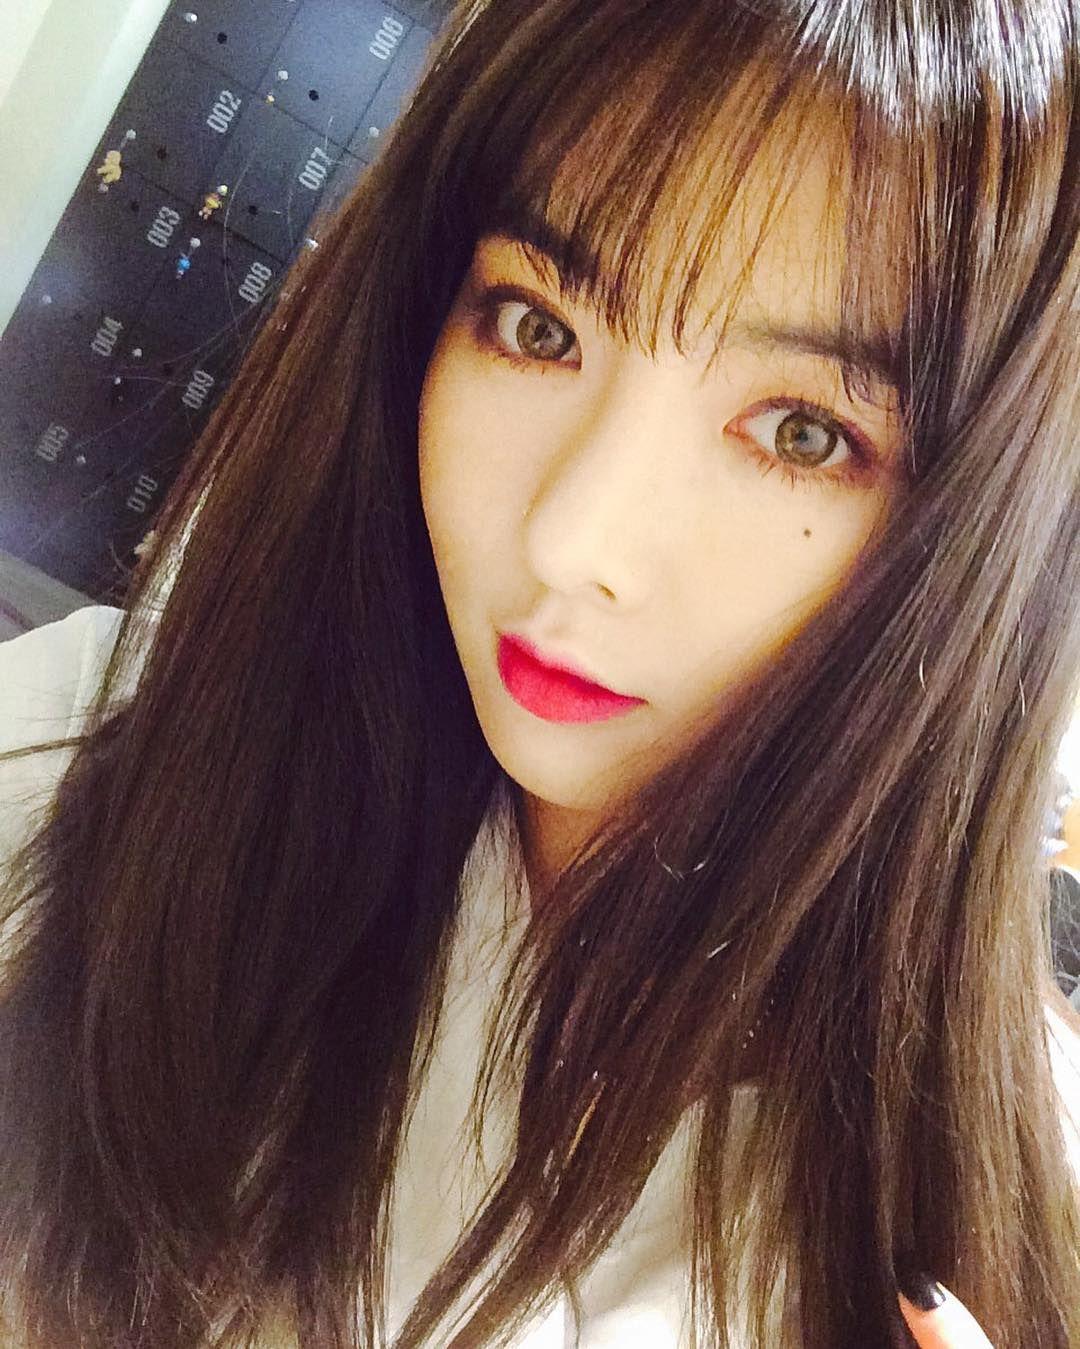 Pin By Nekoz 6 On Hyuna Hyuna Kim Instagram Update Wonder Girls Members